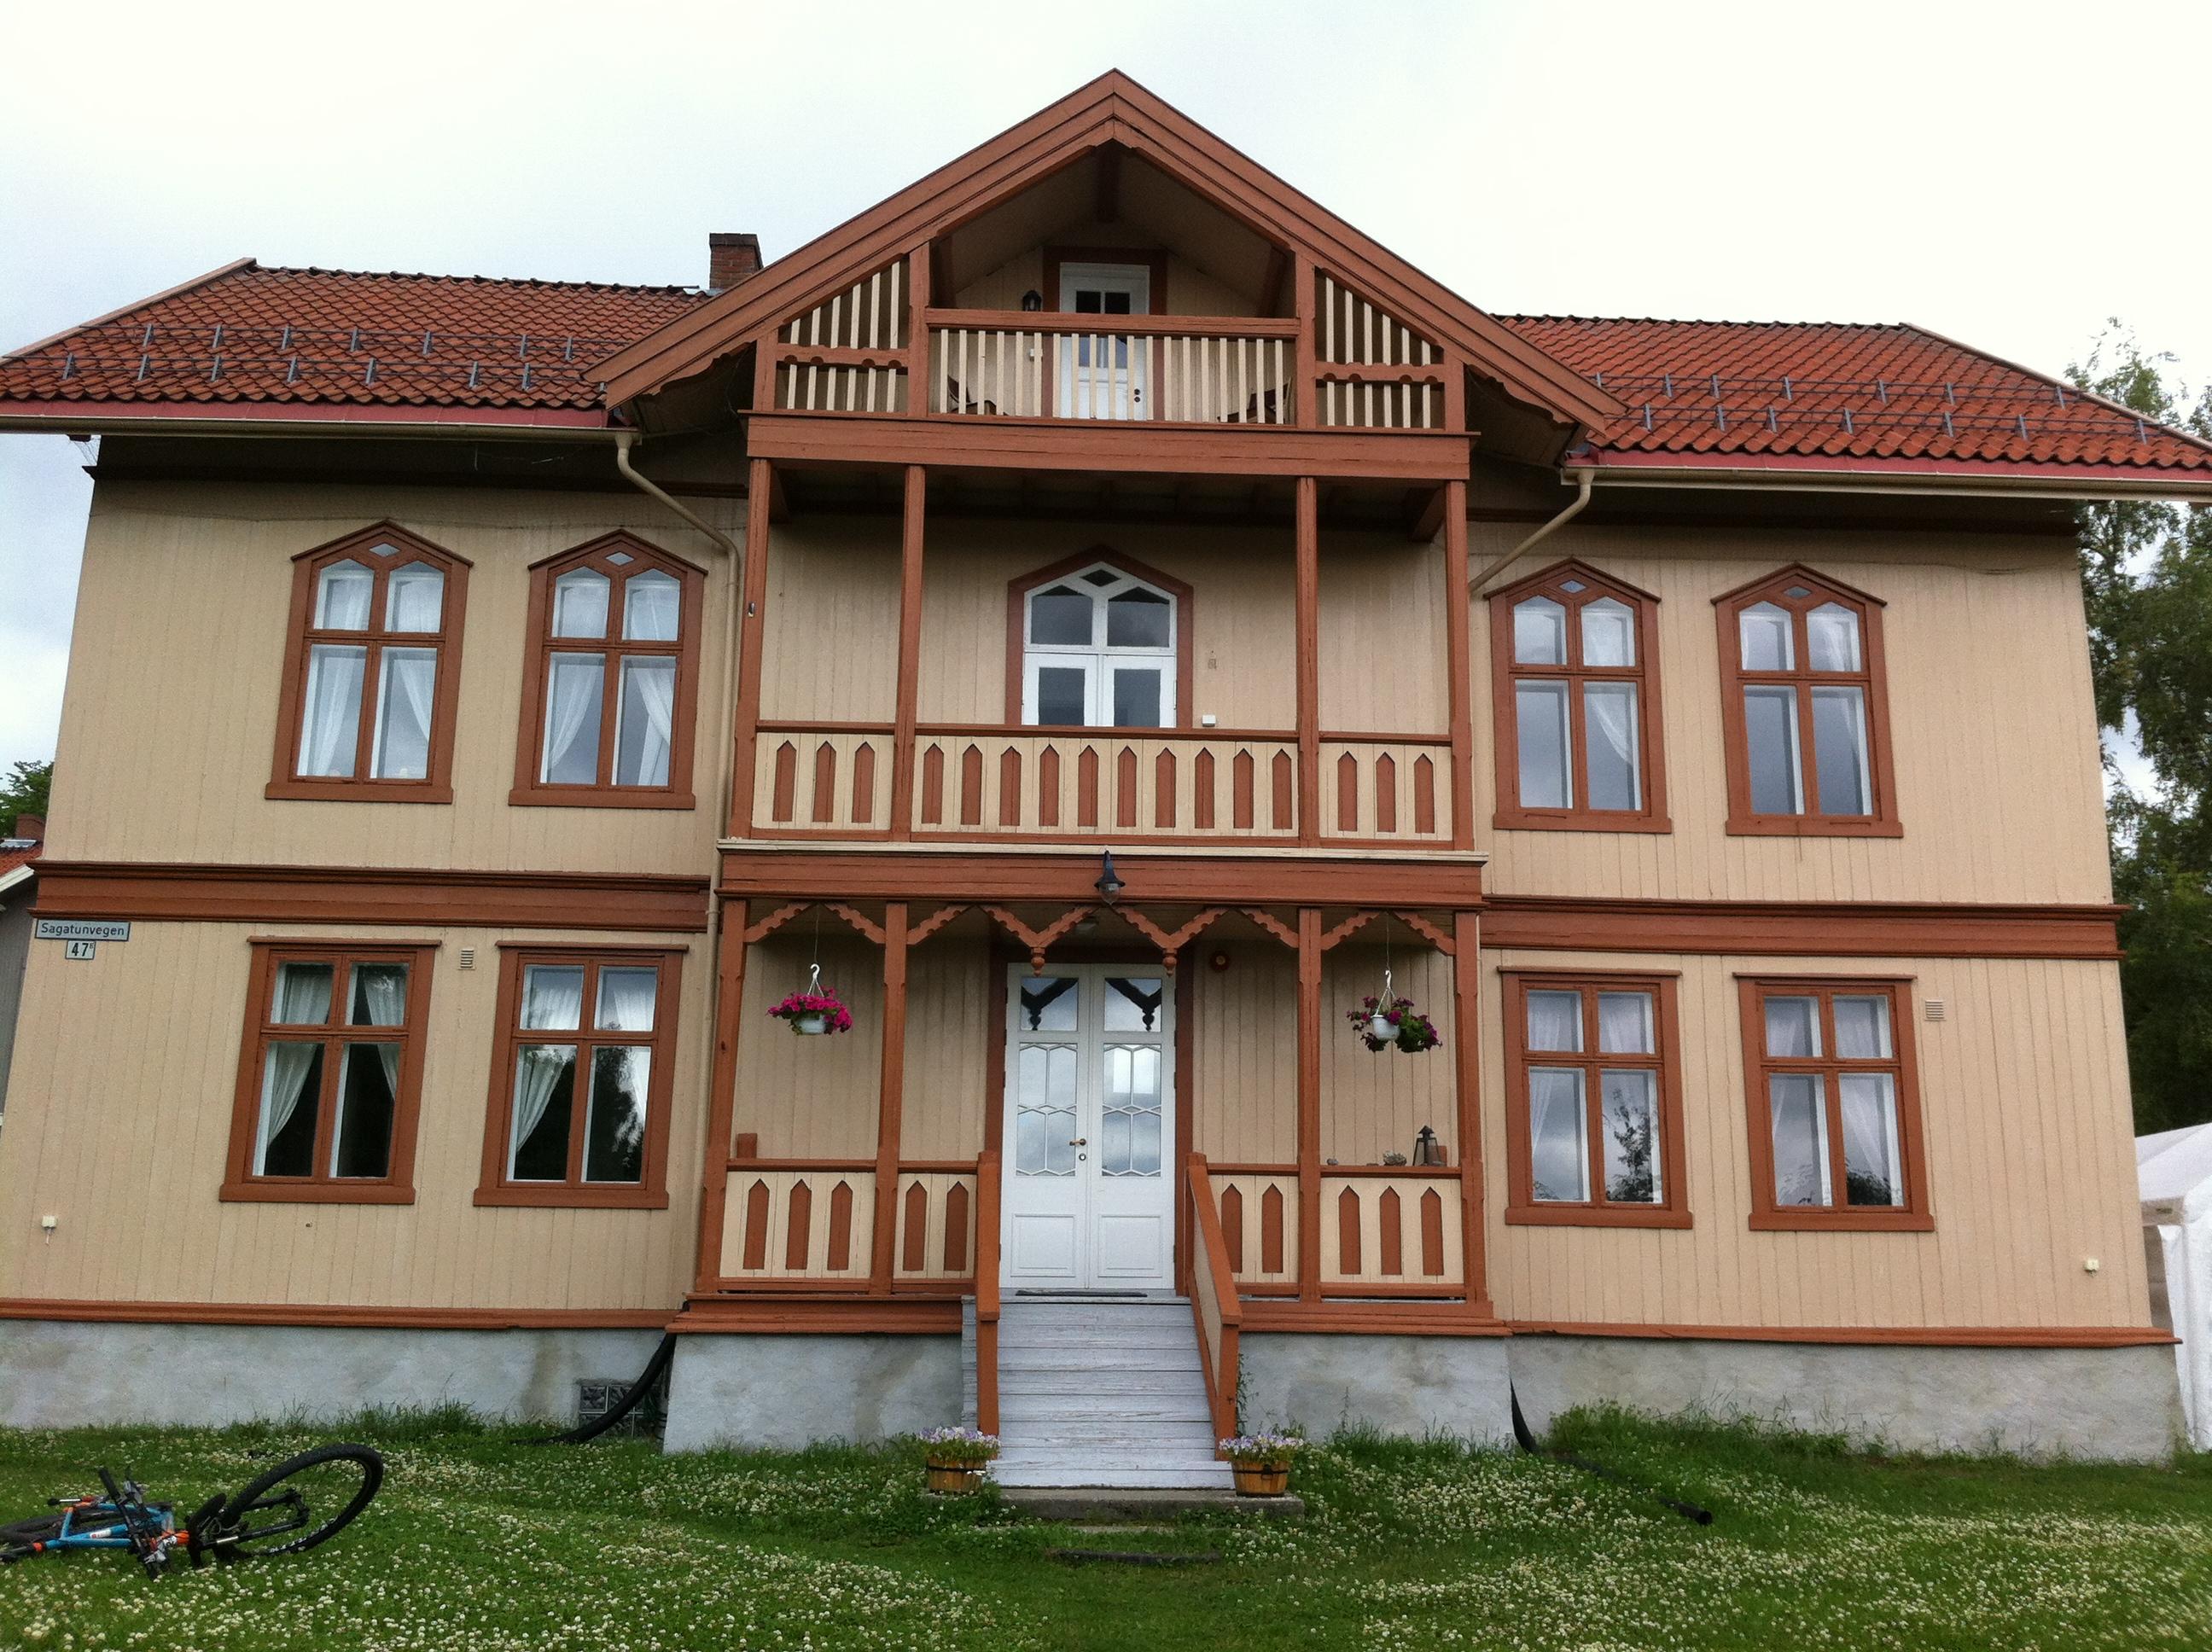 die norwegische seemannskirche in hamburg norwegenstube. Black Bedroom Furniture Sets. Home Design Ideas